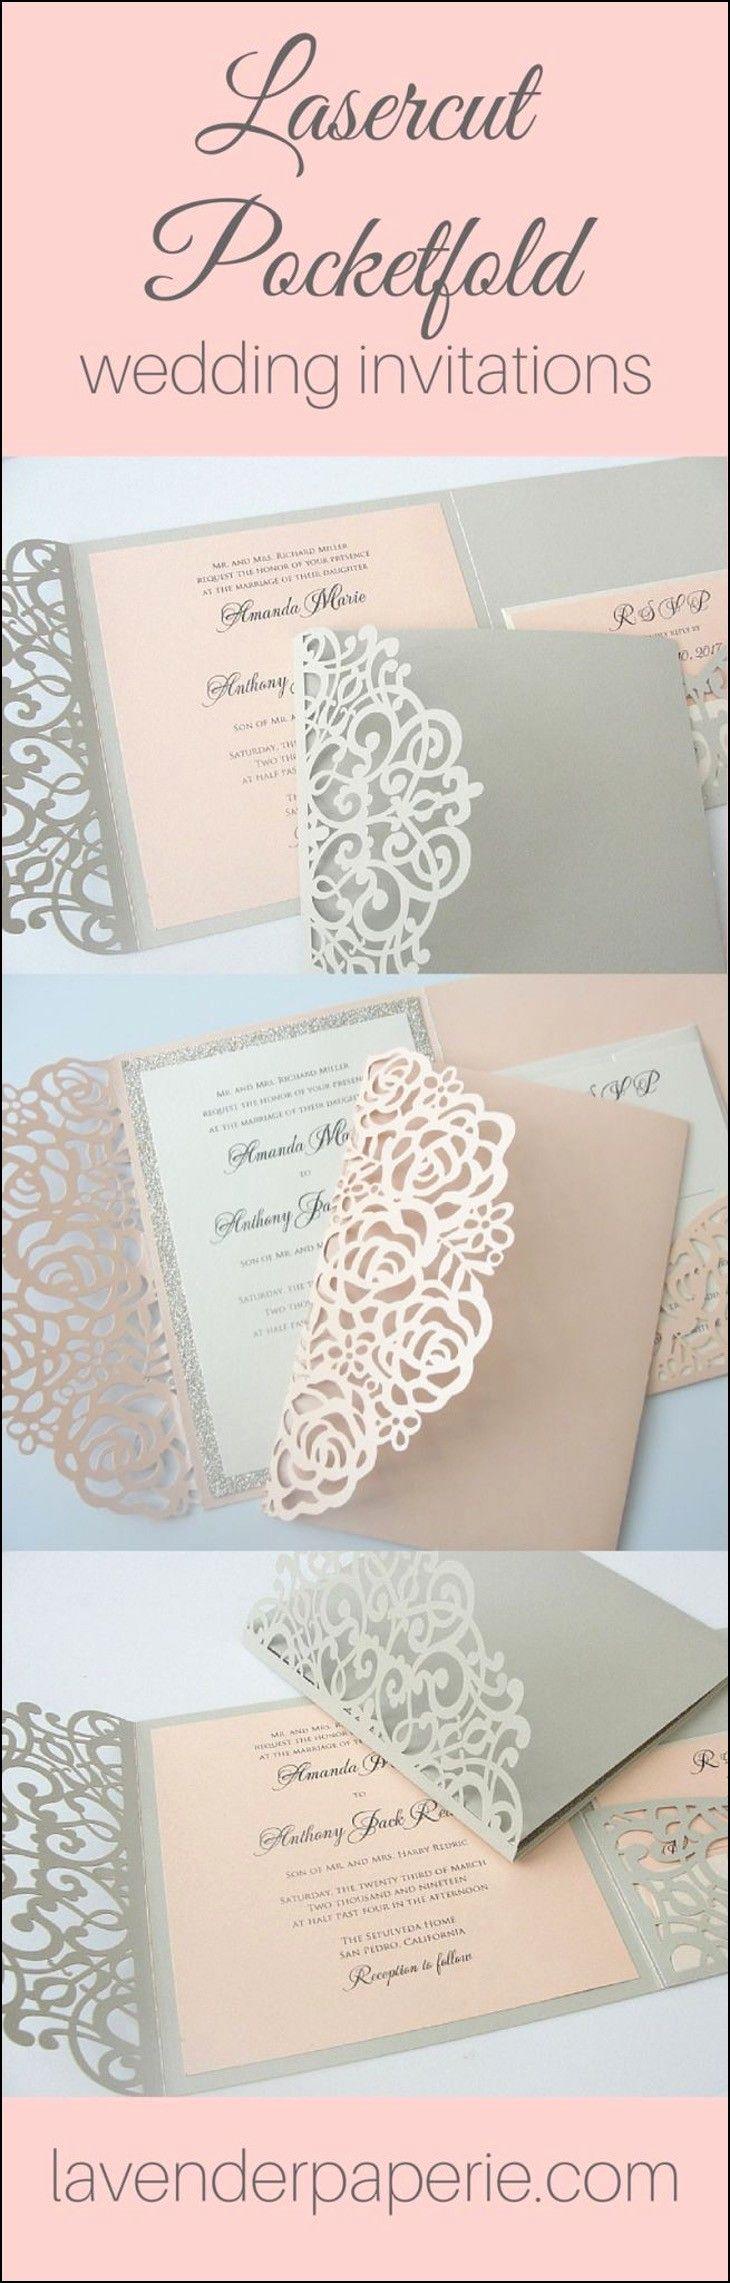 Cricut Wedding Invitation Ideas Fresh Best 25 Cricut Wedding Invitations Ideas On Pinterest